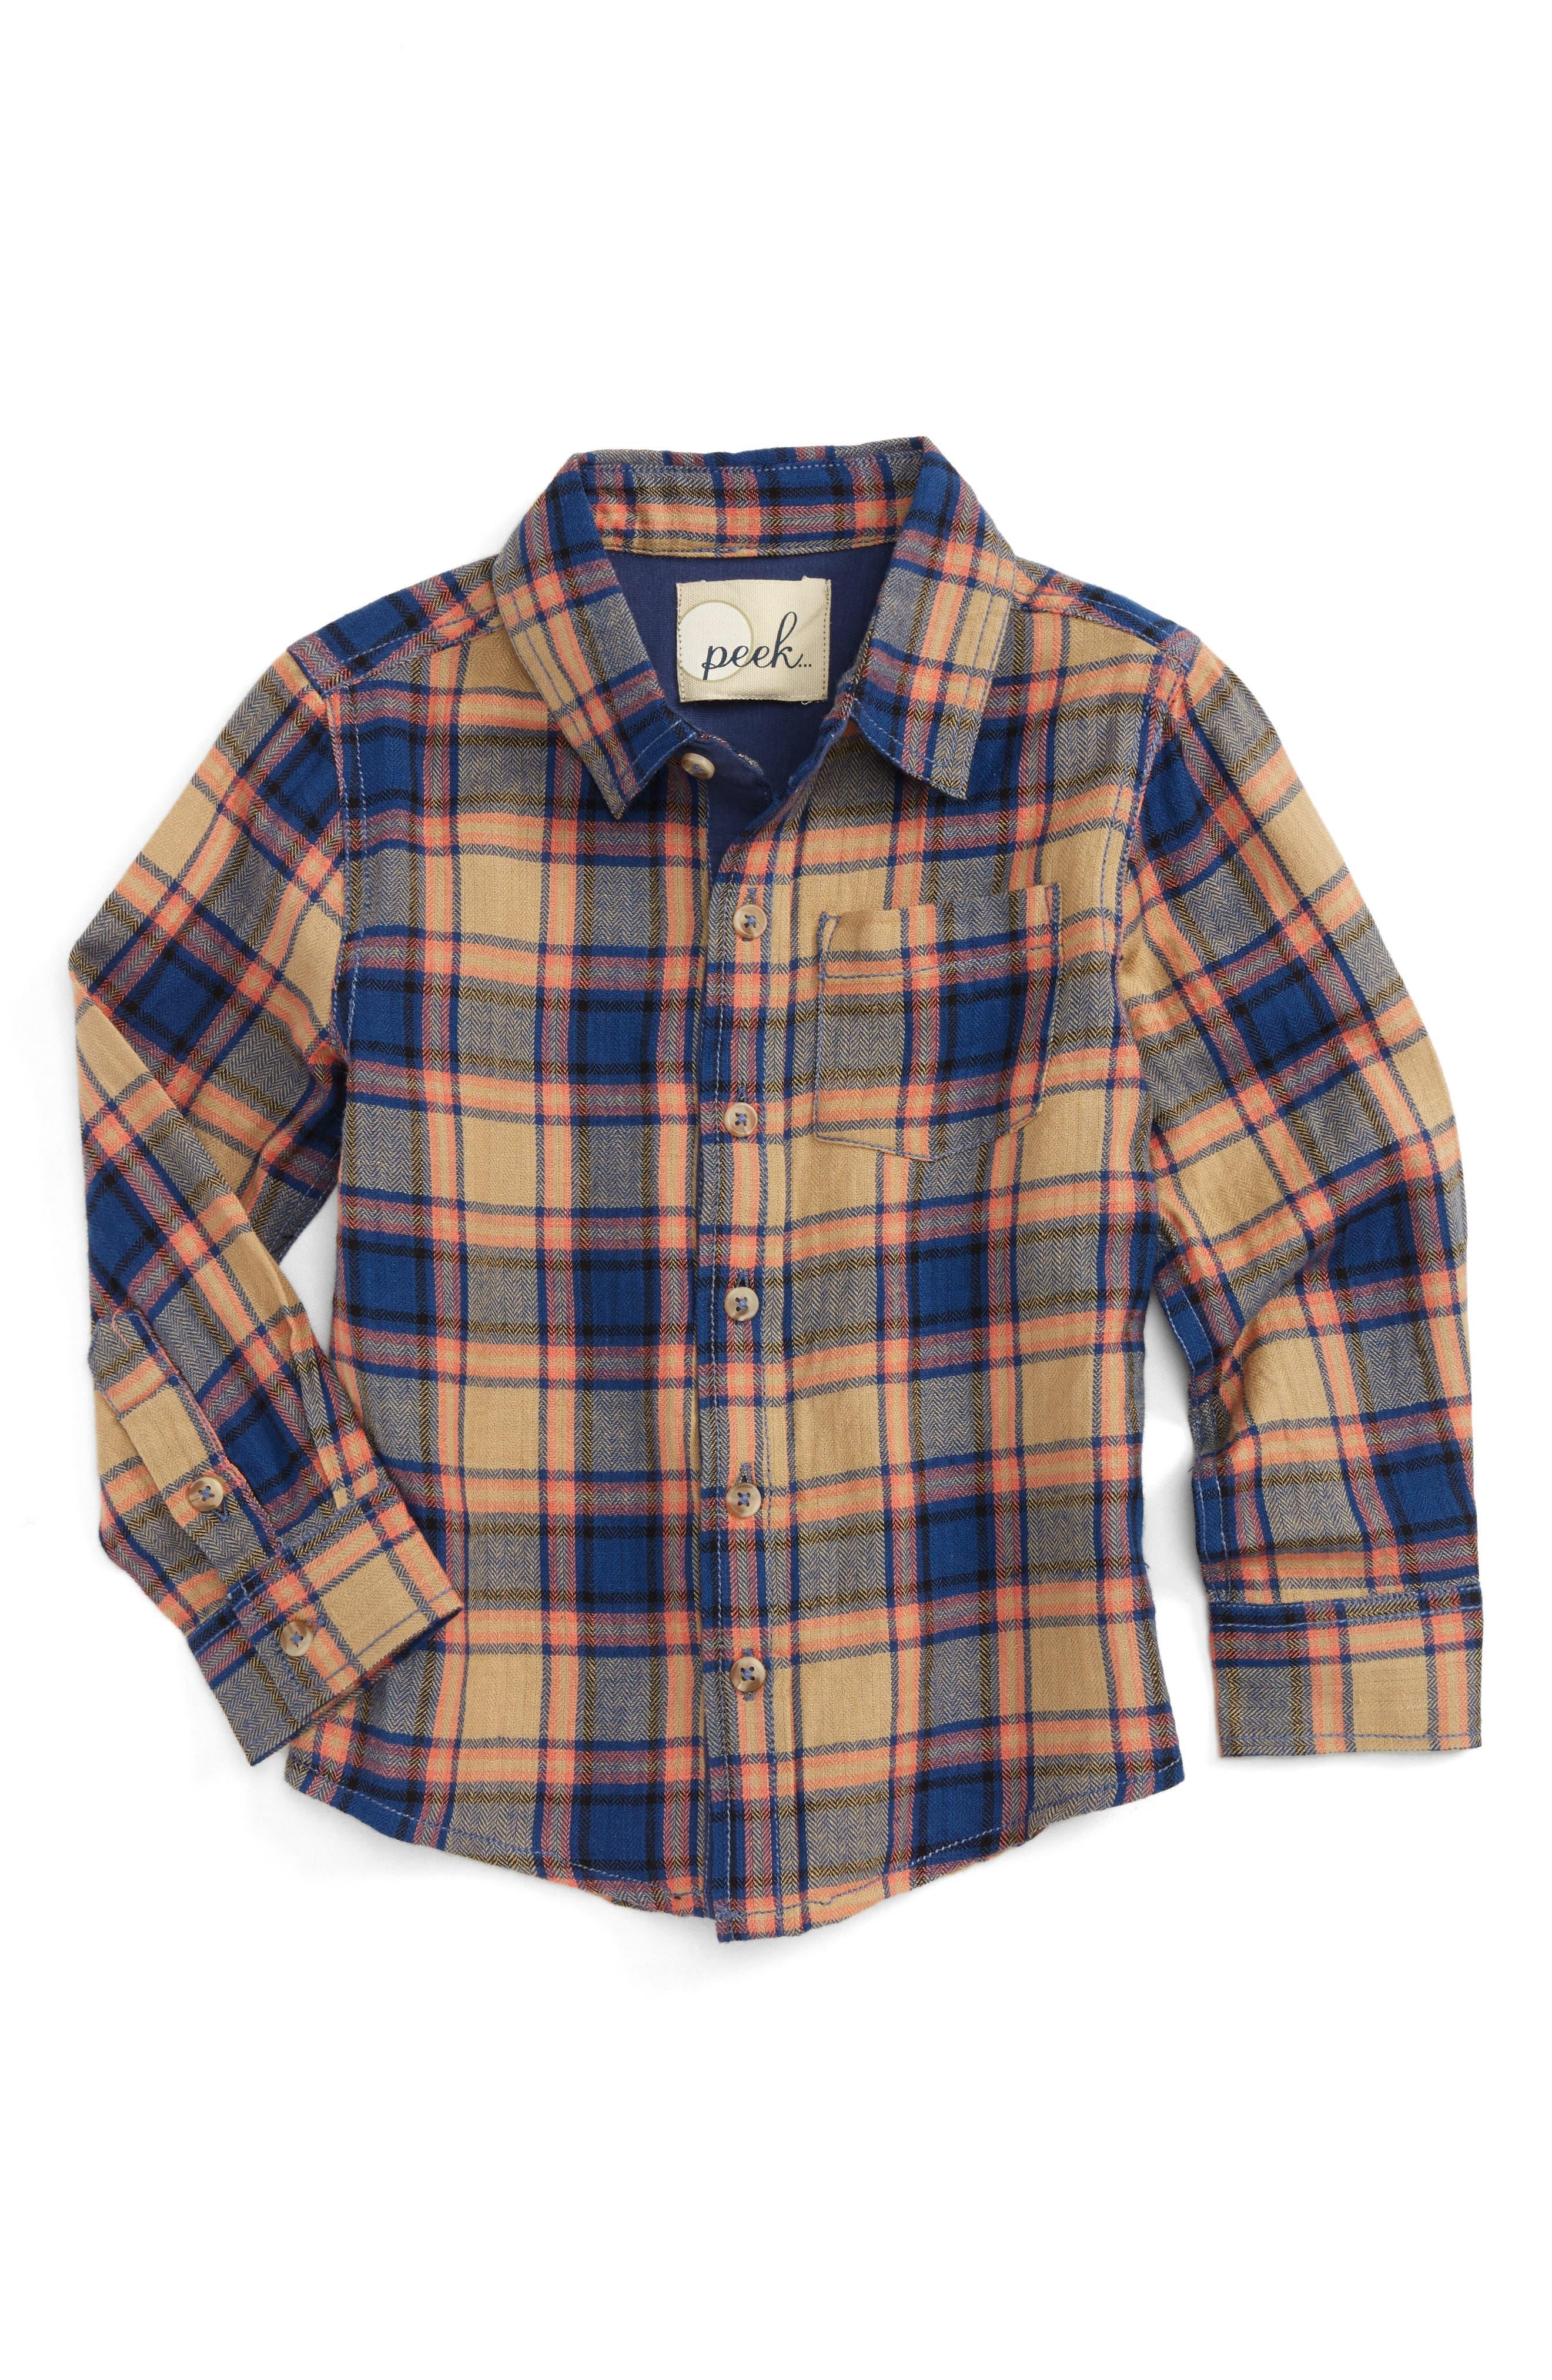 Main Image - Peek Henry Plaid Woven Shirt (Toddler Boys, Little Boys & Big Boys)